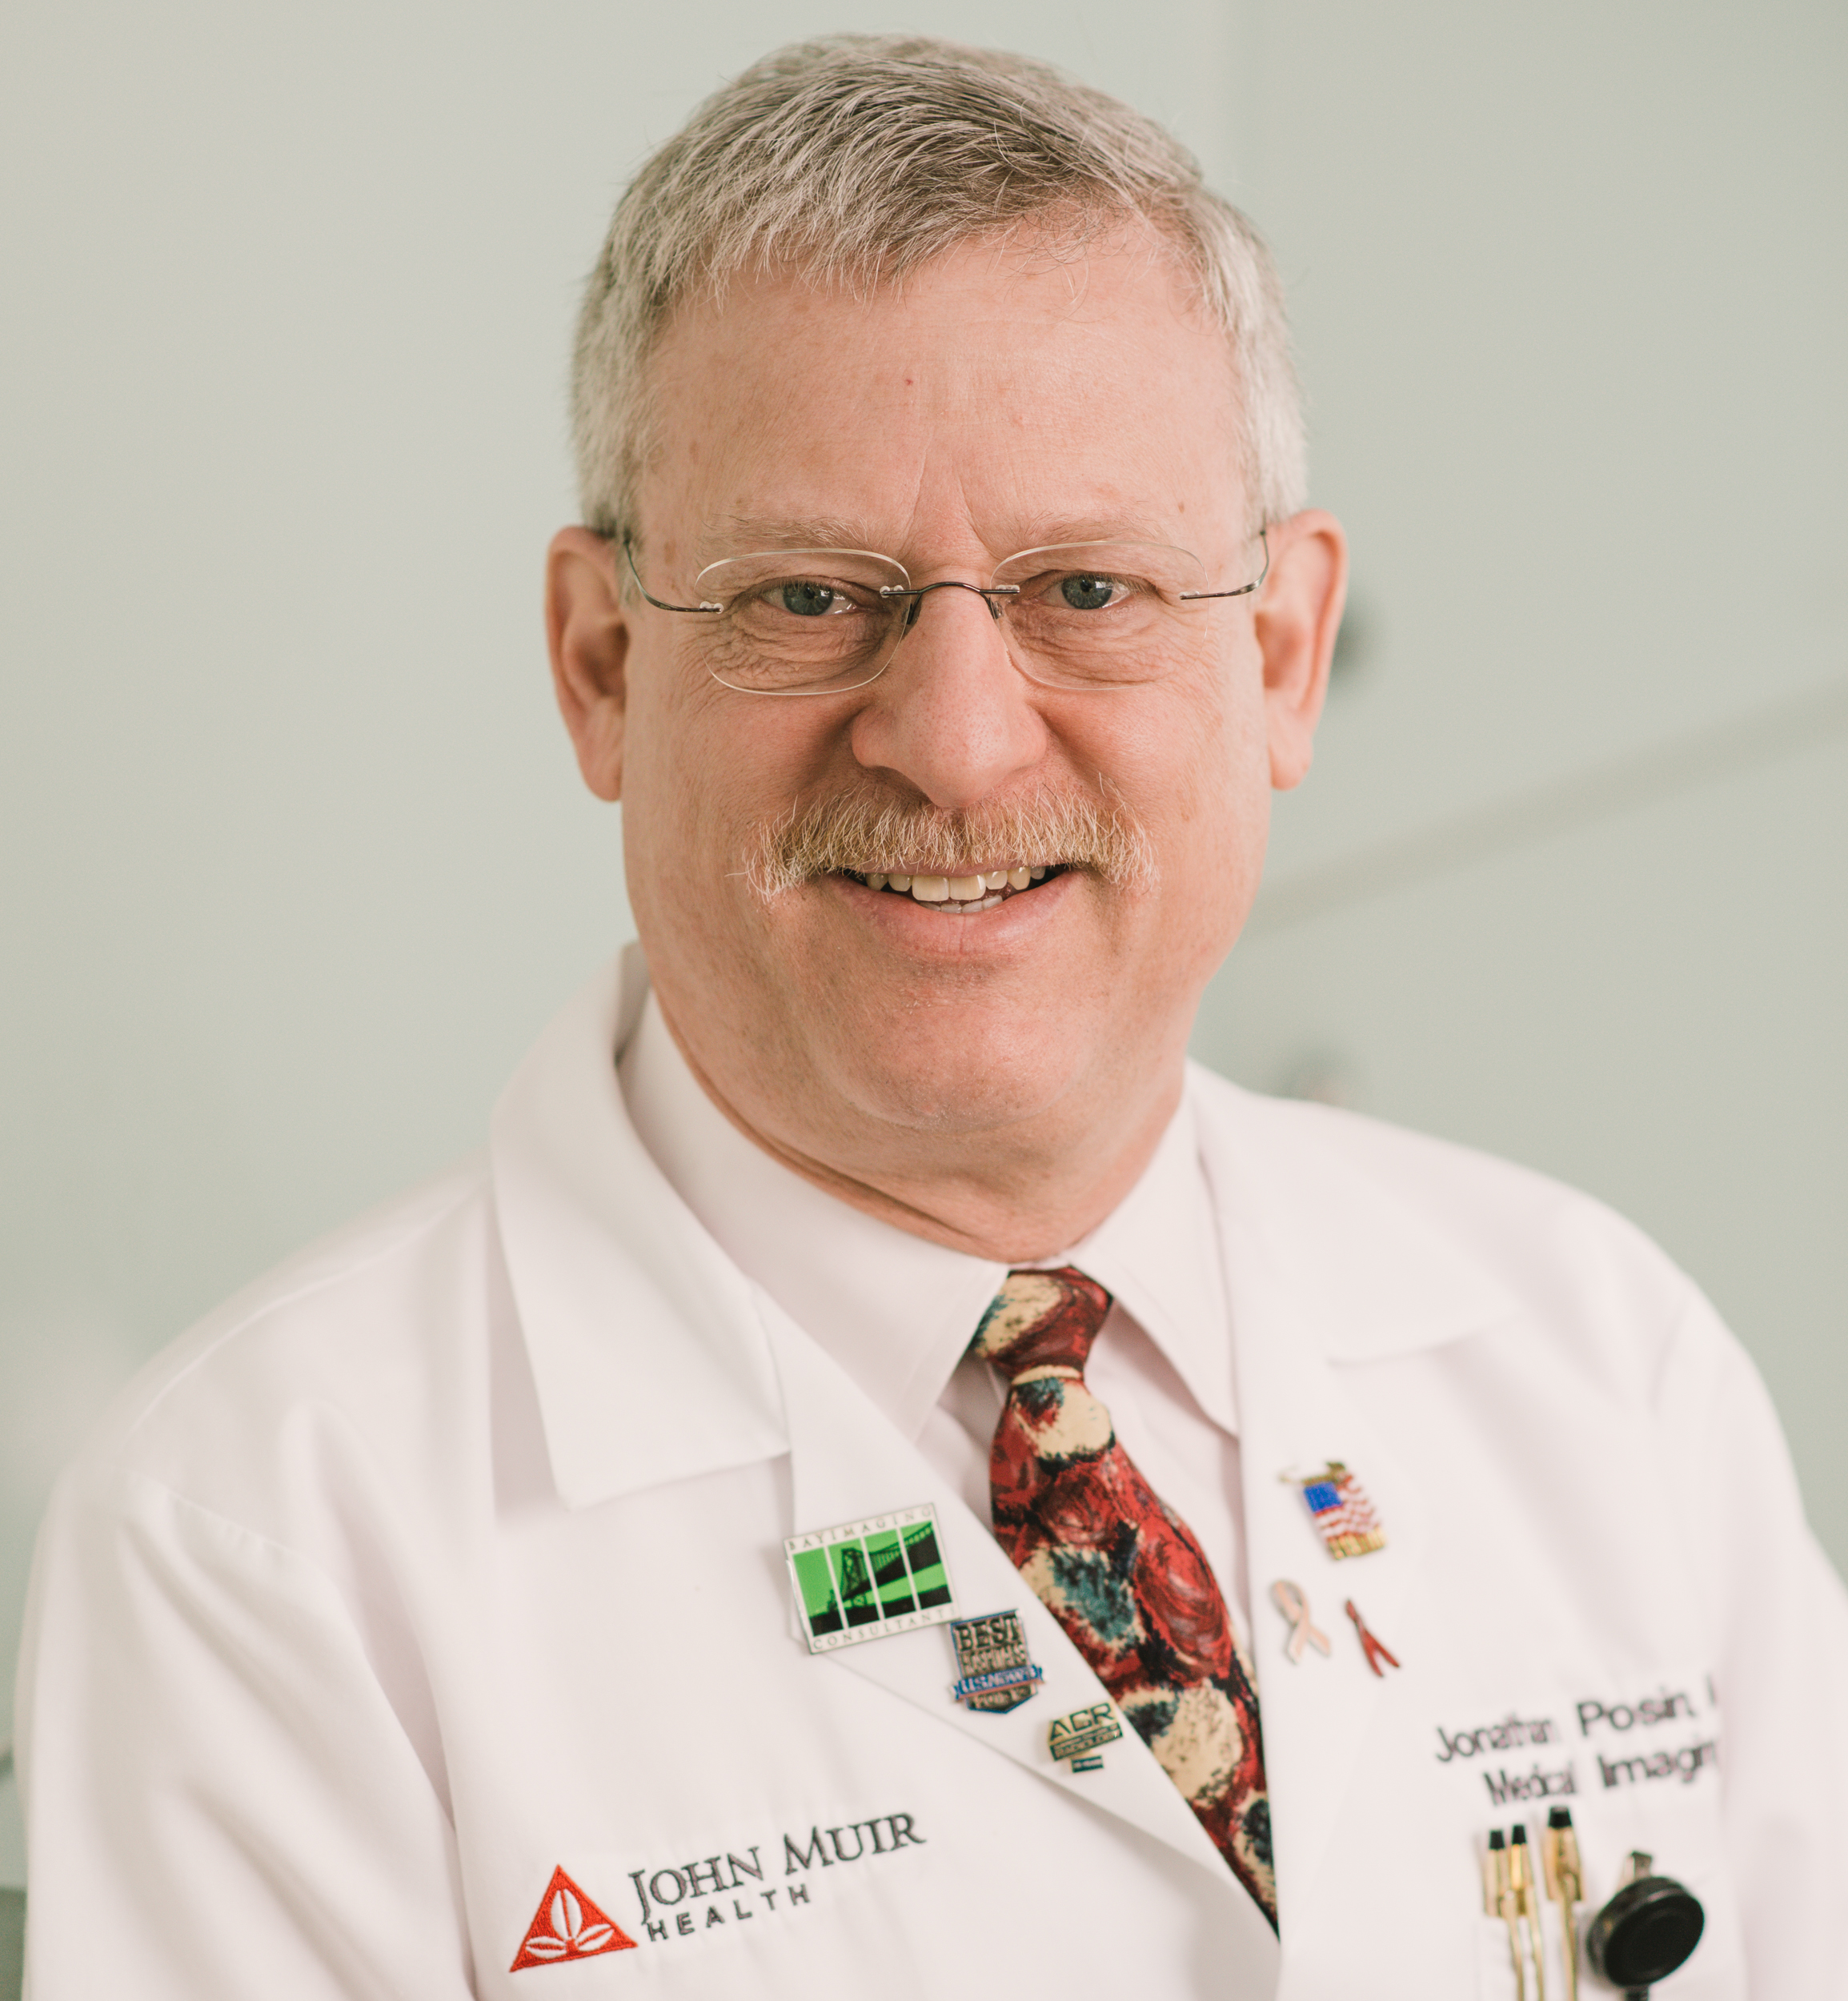 Jonathan Posin, womens imaging, neuroradiology, nuclear medicine pet radiology